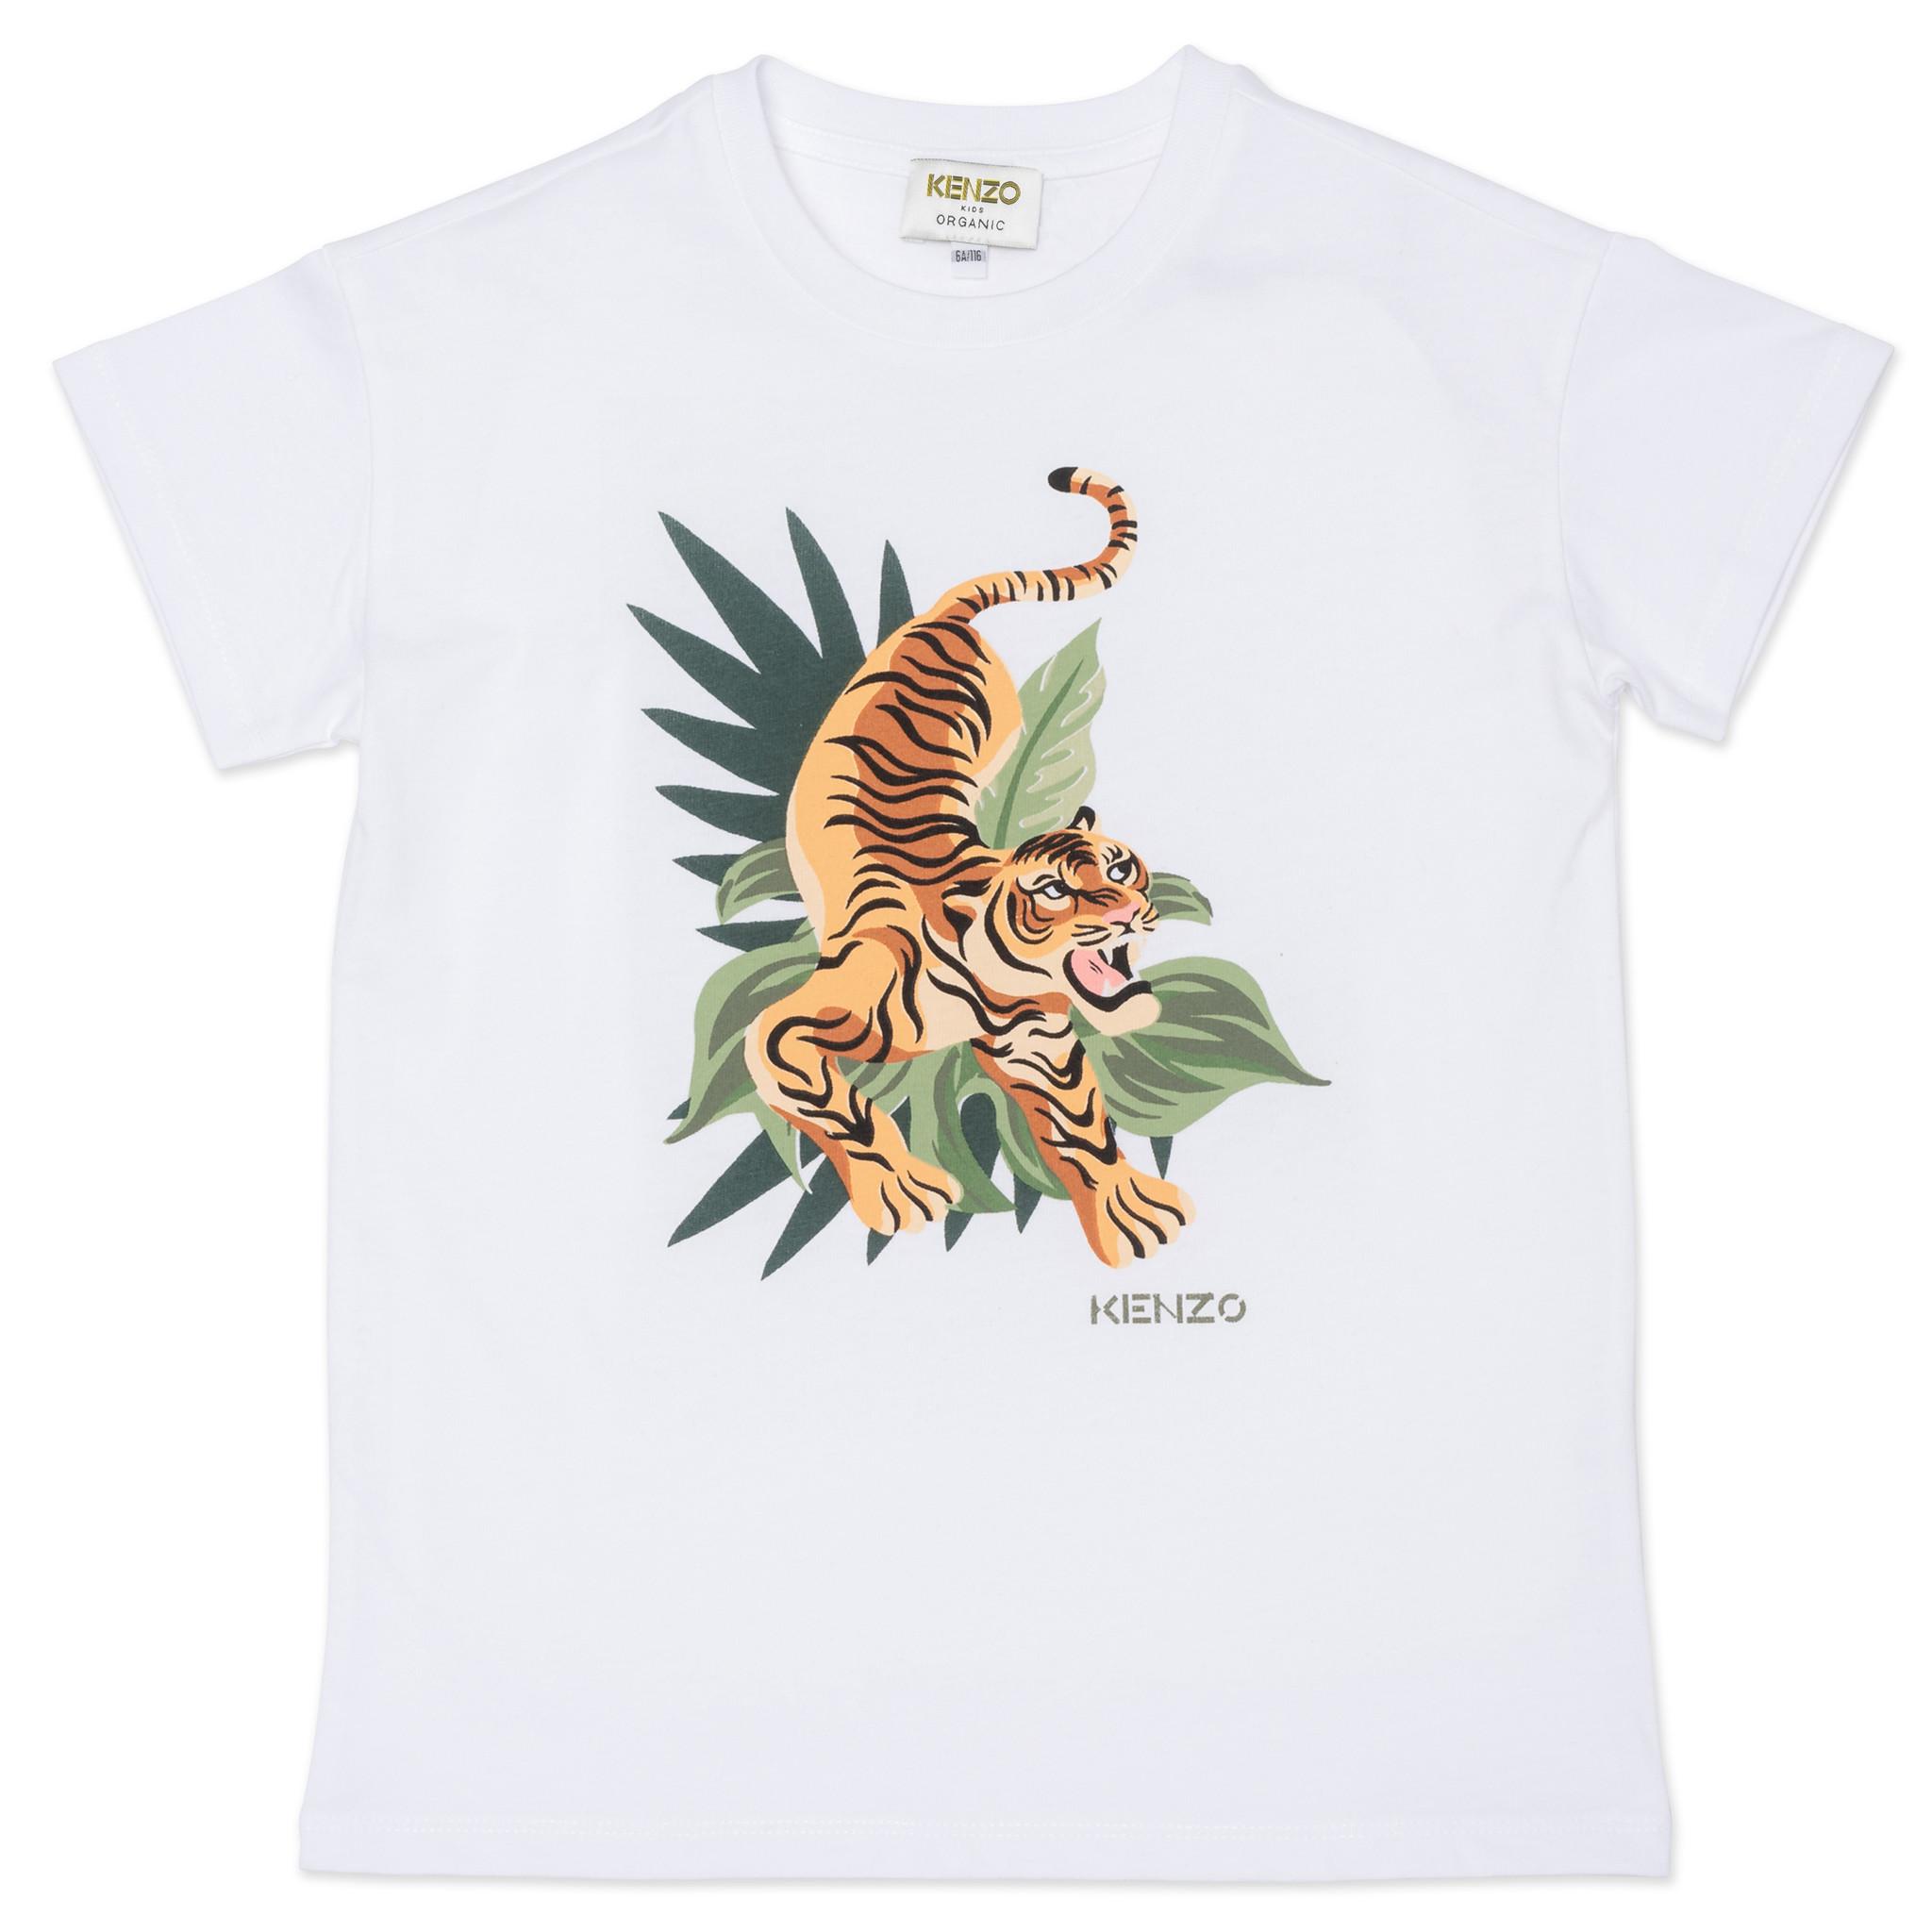 KENZO KIDS t-shirt avec tigre imprimé-1